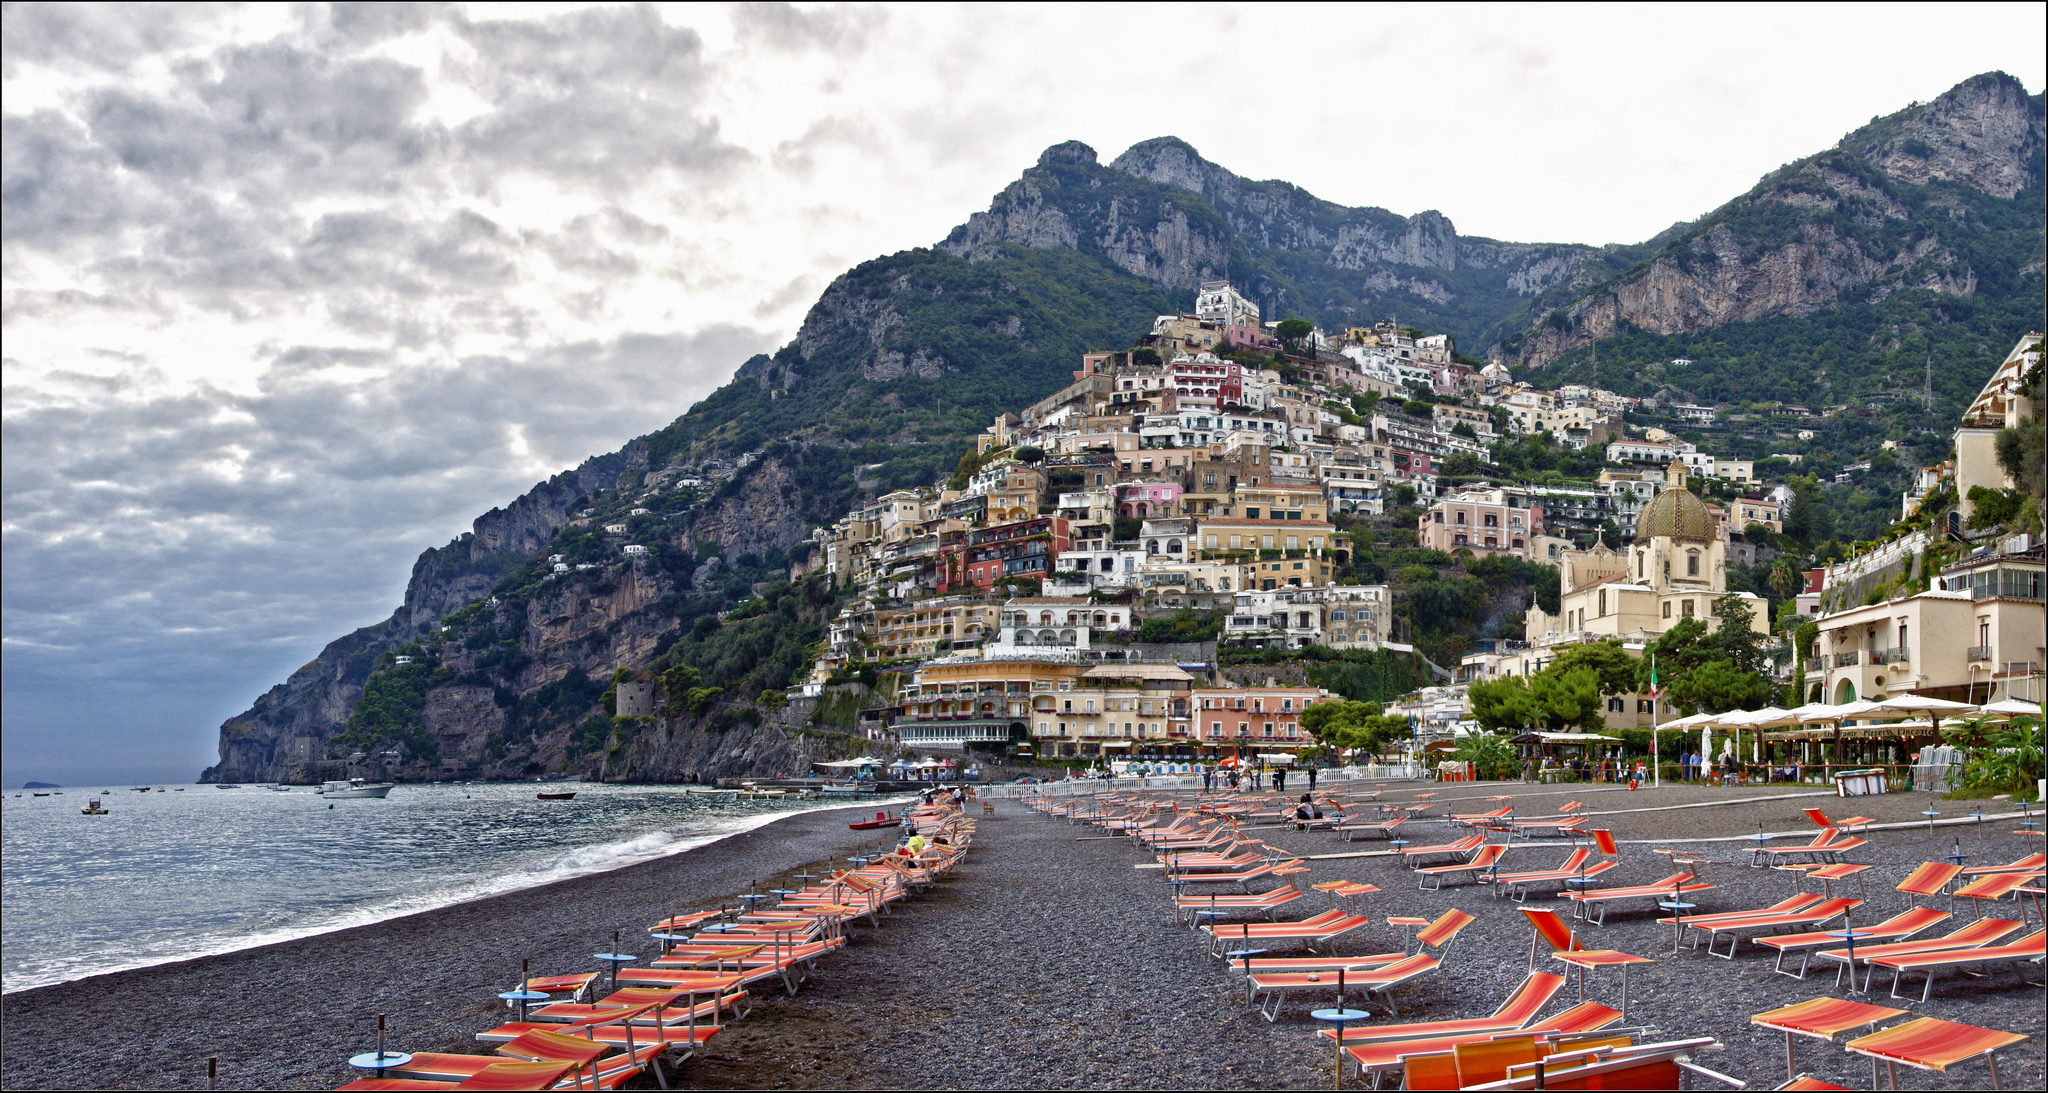 Plazh_Positano_Italia_Italy_Solerno